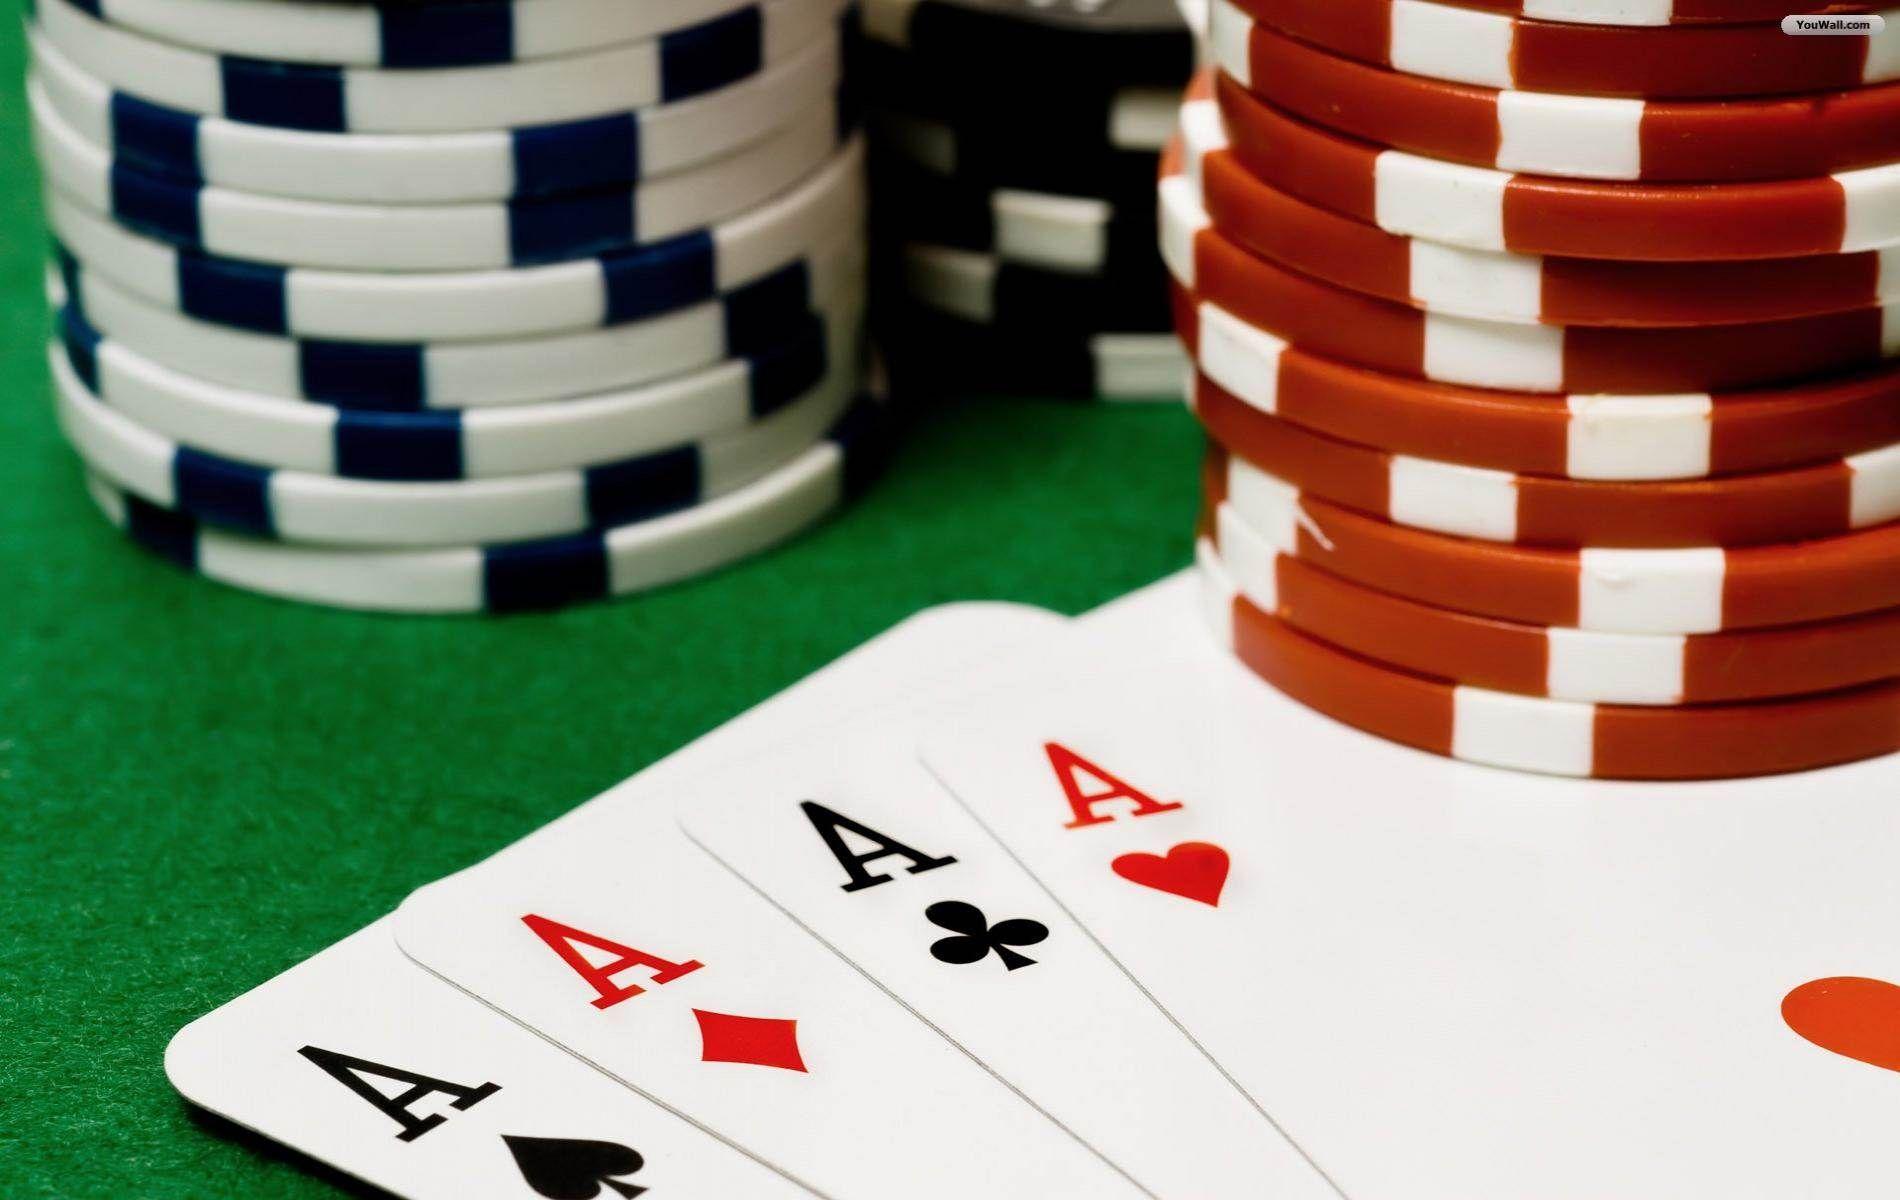 free roulette online no deposit